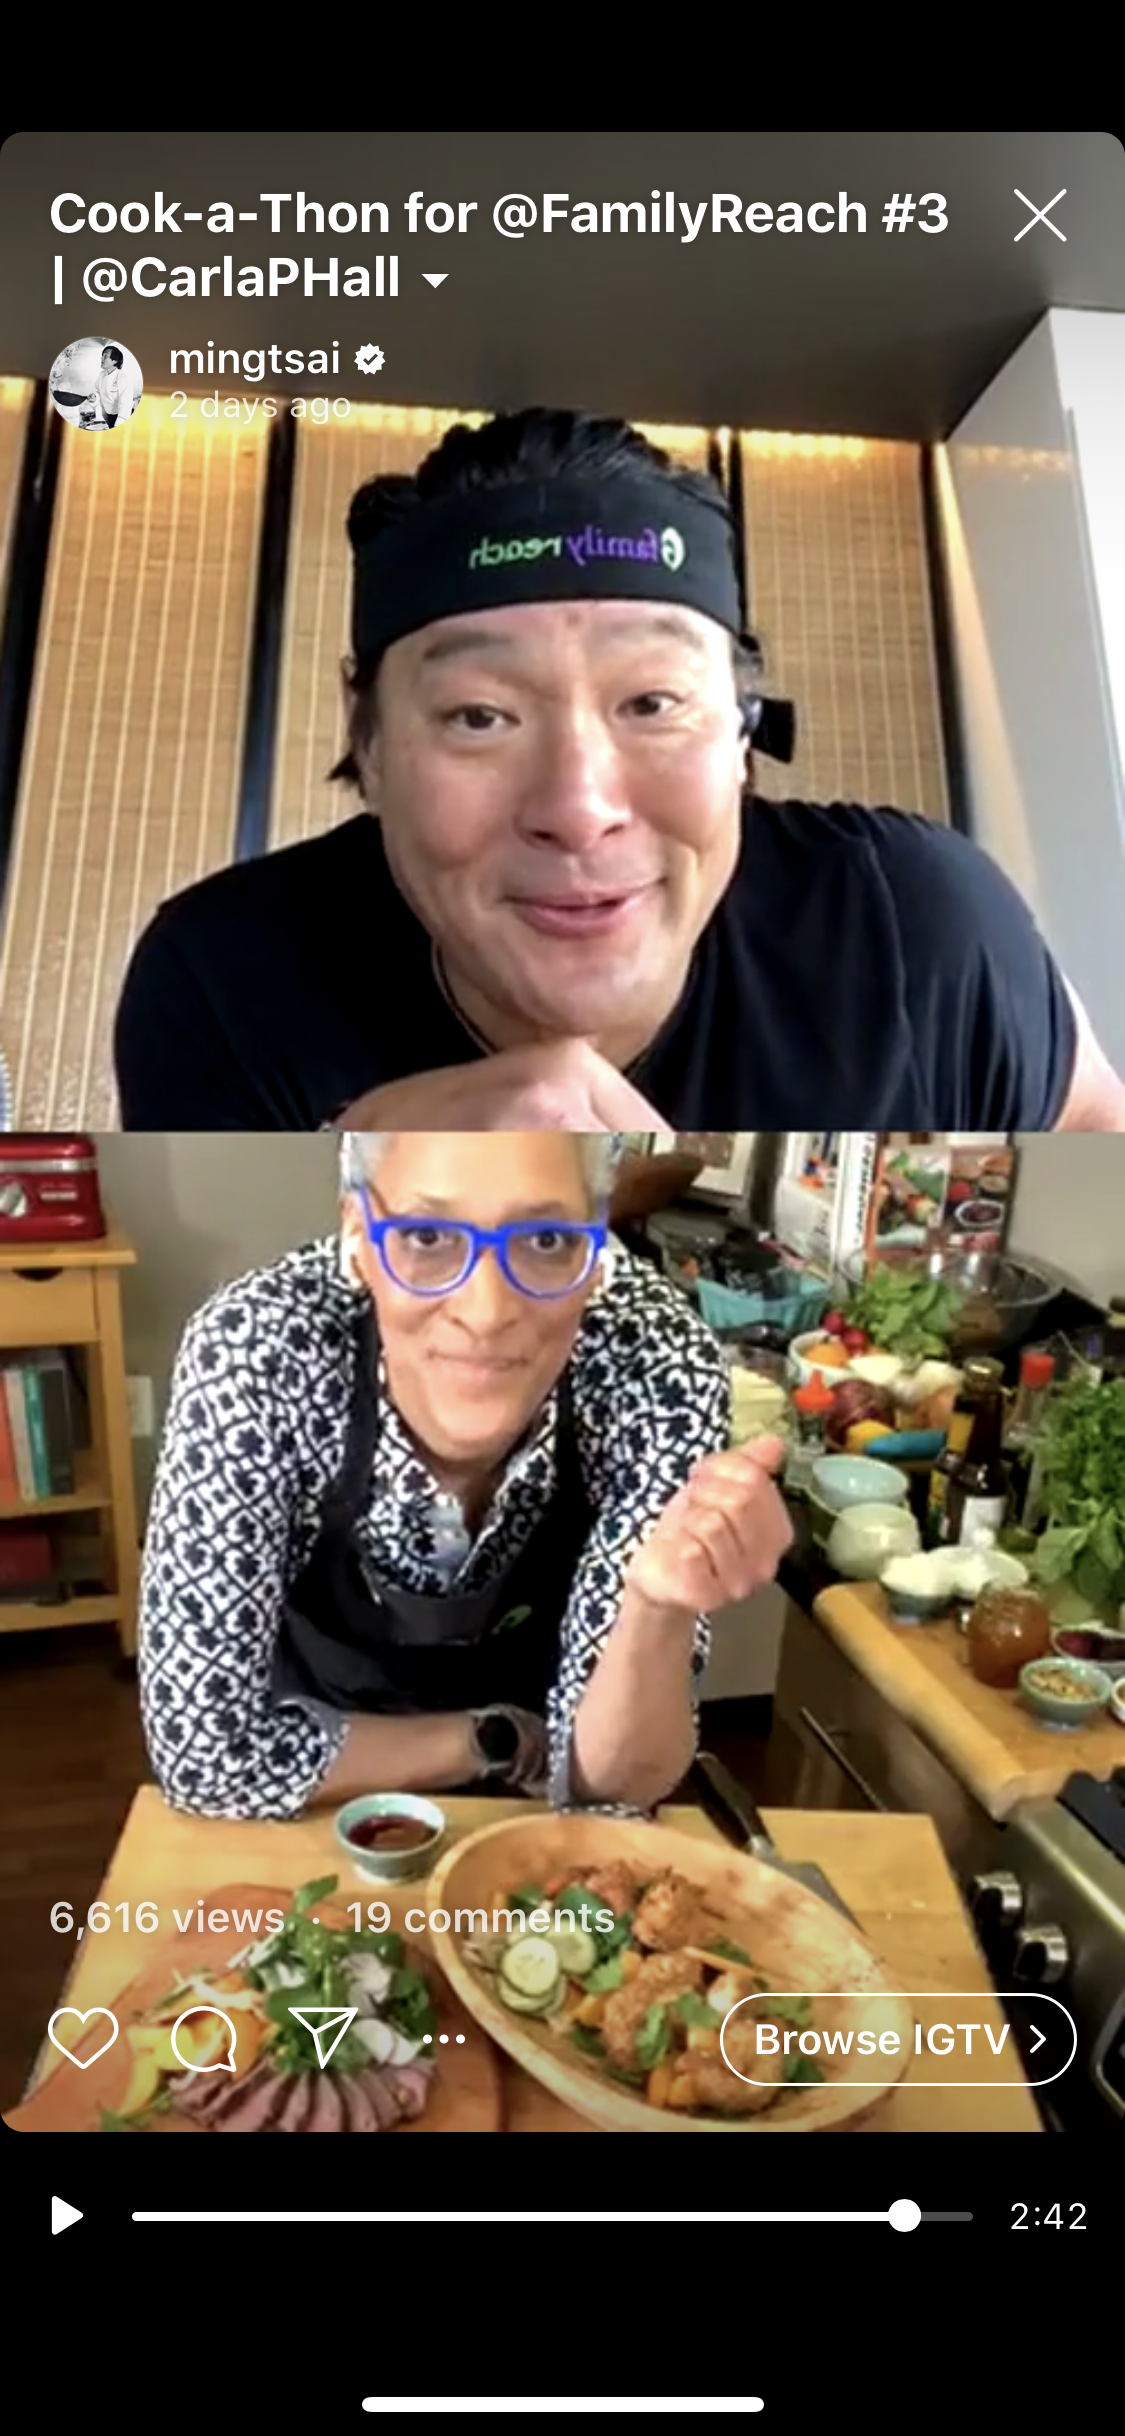 Chef Ming and Carla Hall